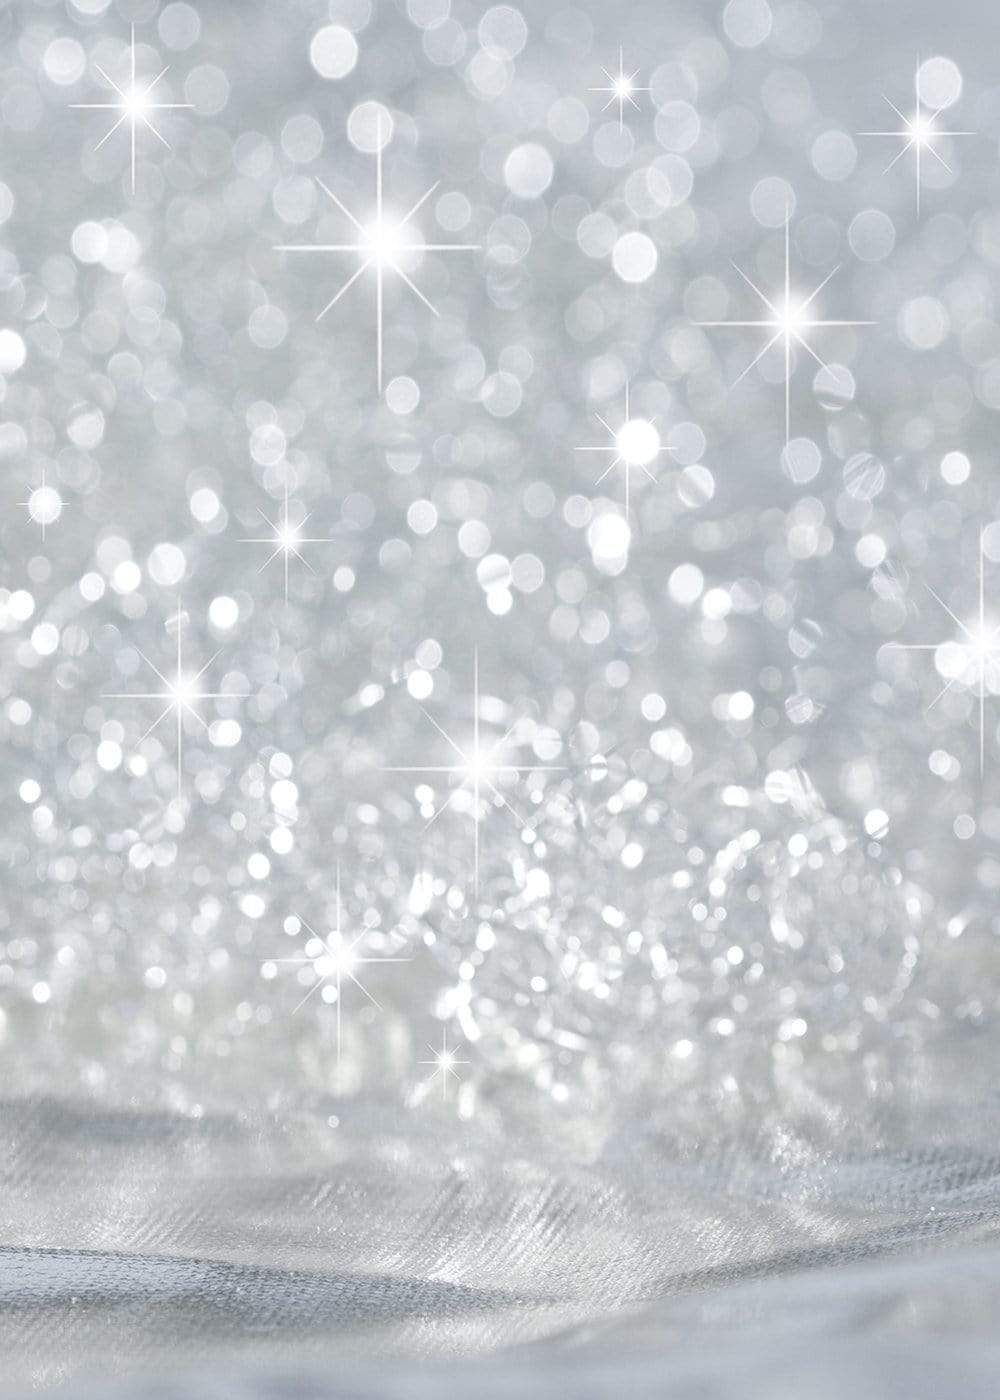 Kate Silver Bokeh Photography Backdrops Glitter Stars Spots - 3x5ft(1x1.5m)